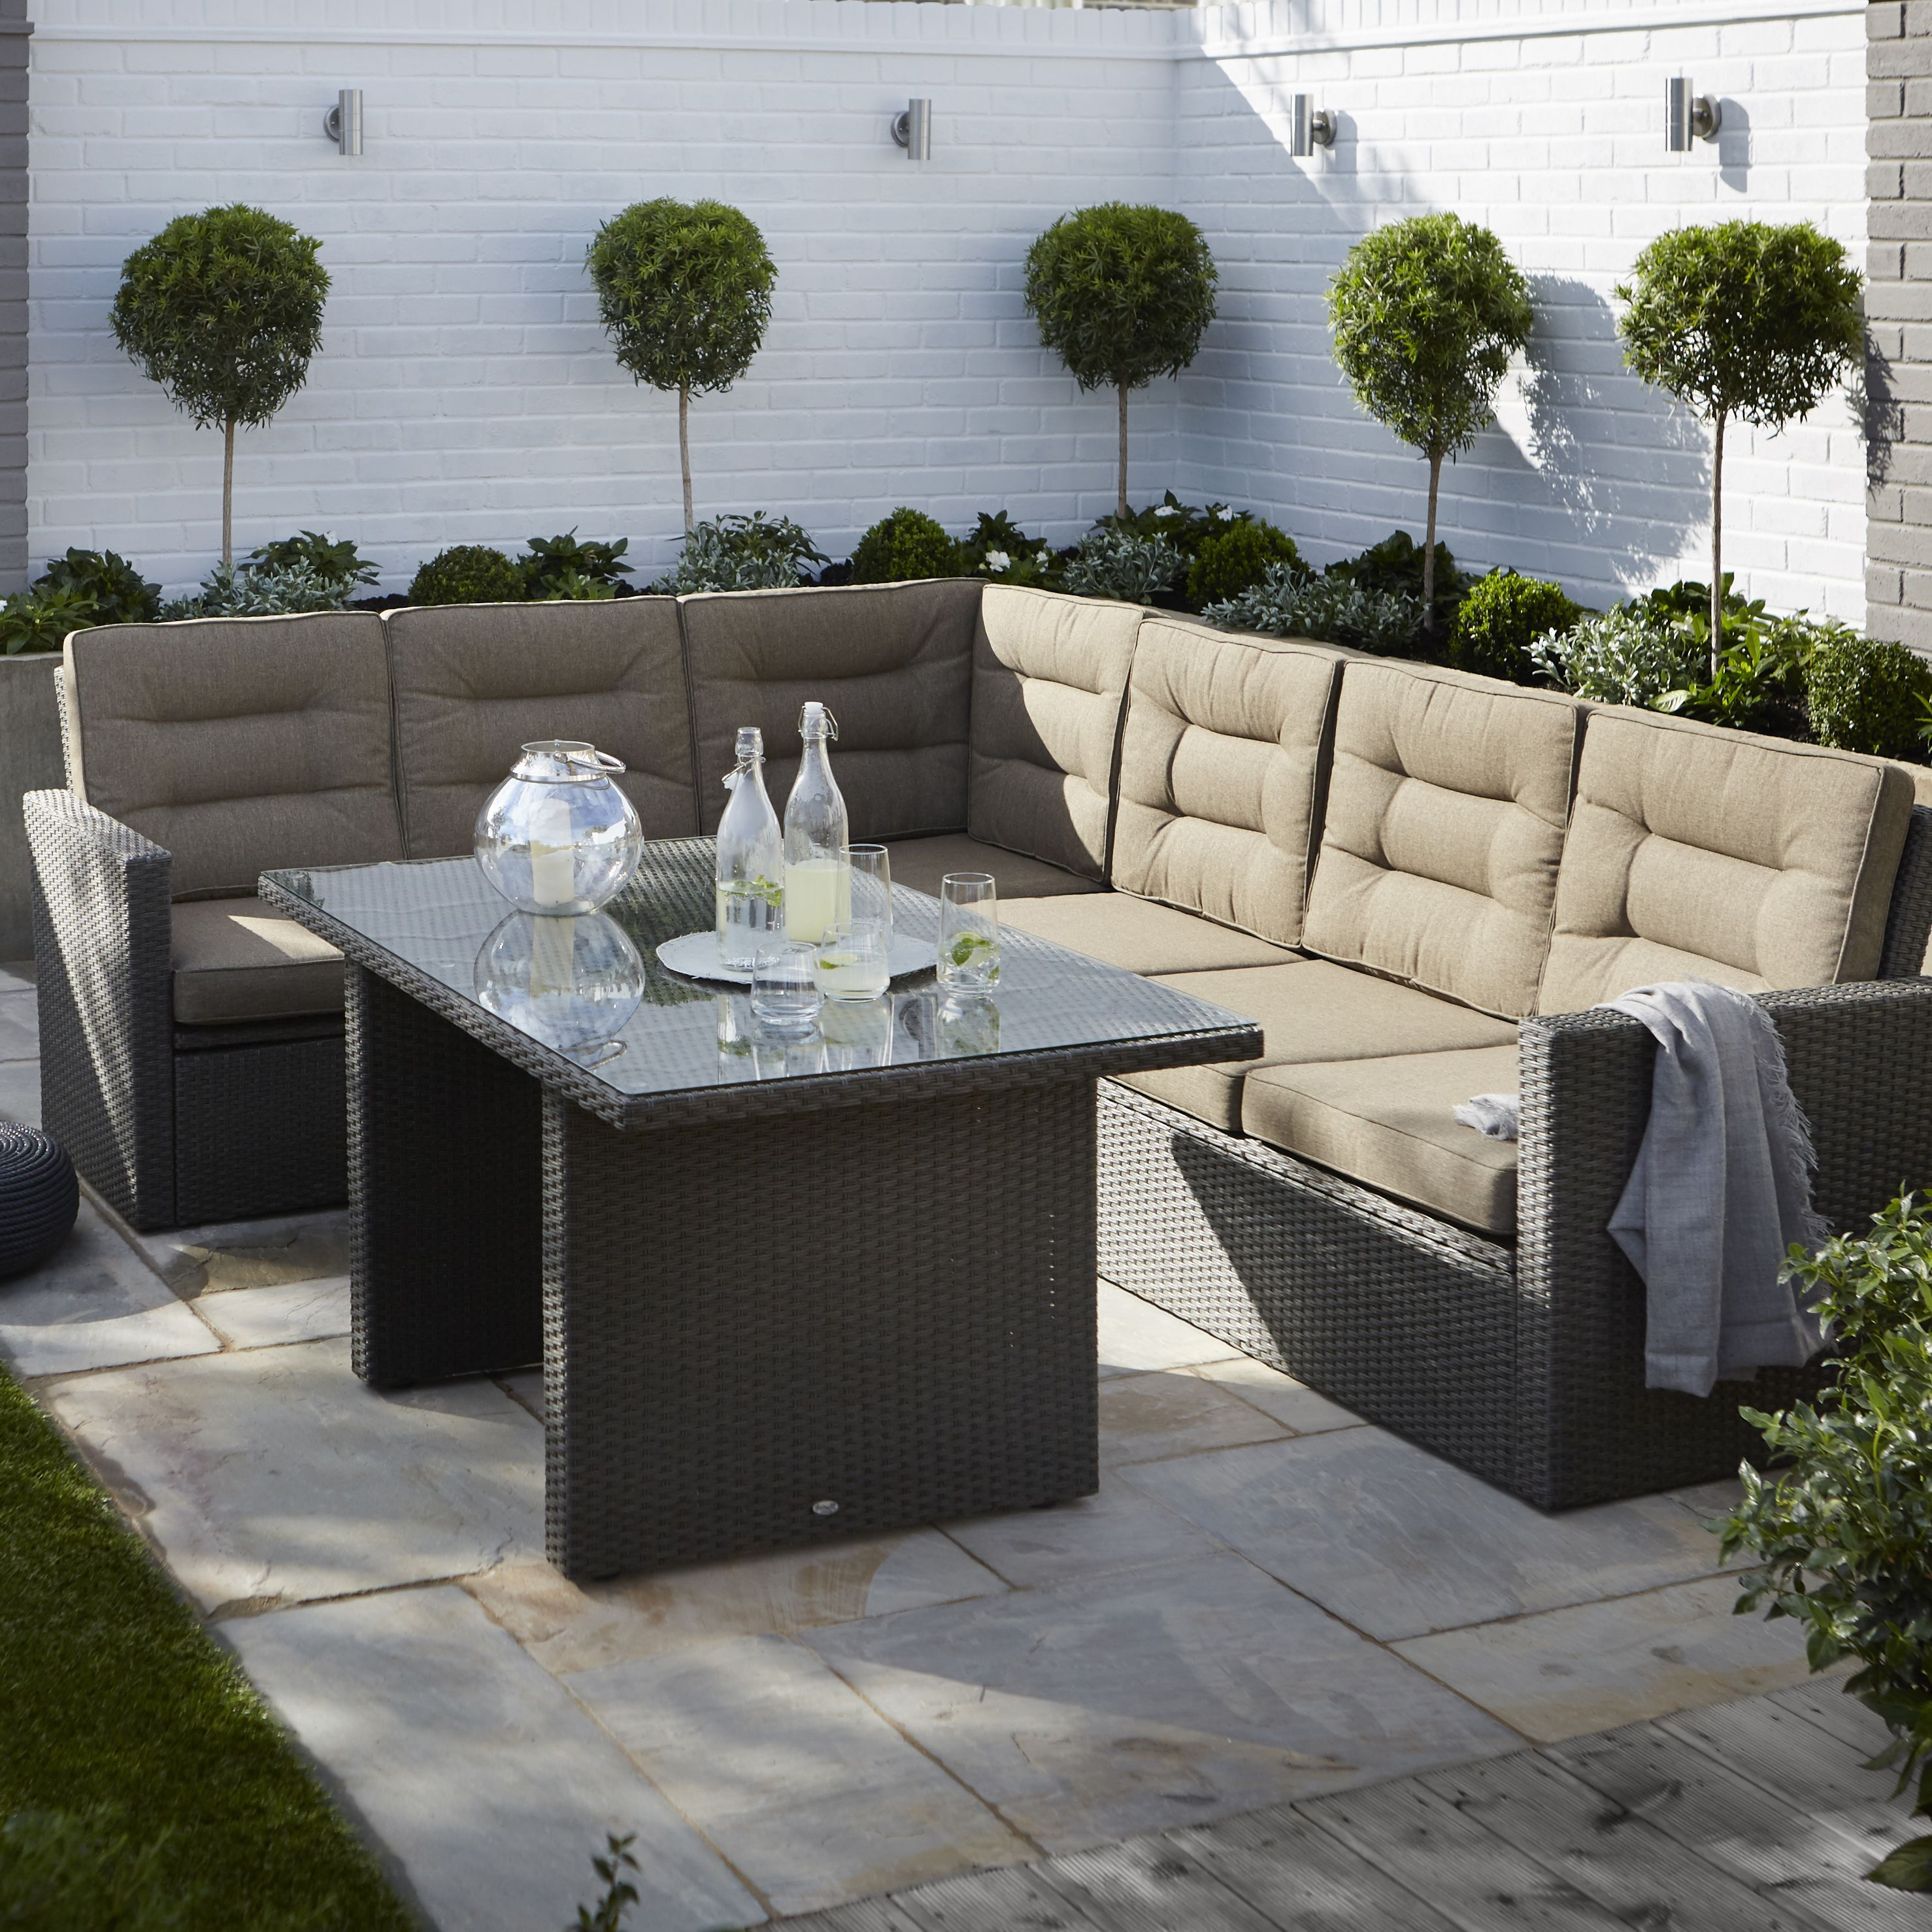 Kington Rattan Effect 7 Seater Dining Set Departments Diy At B Q Garden Furniture Garden Furniture Sets Outdoor Garden Furniture